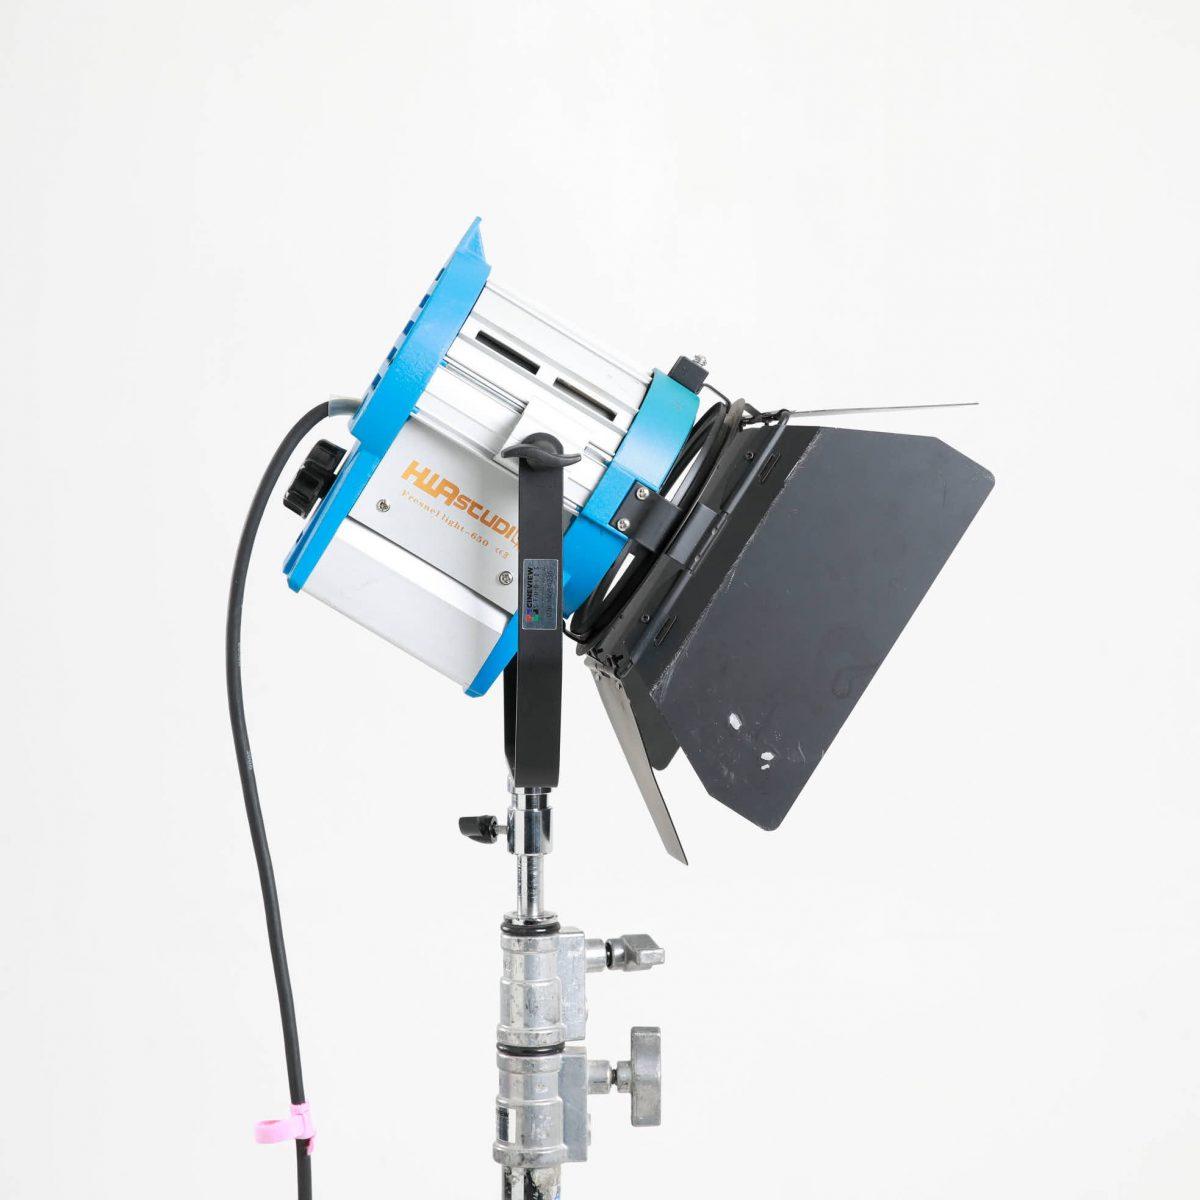 hwastudio-650w-light-rent-in-london